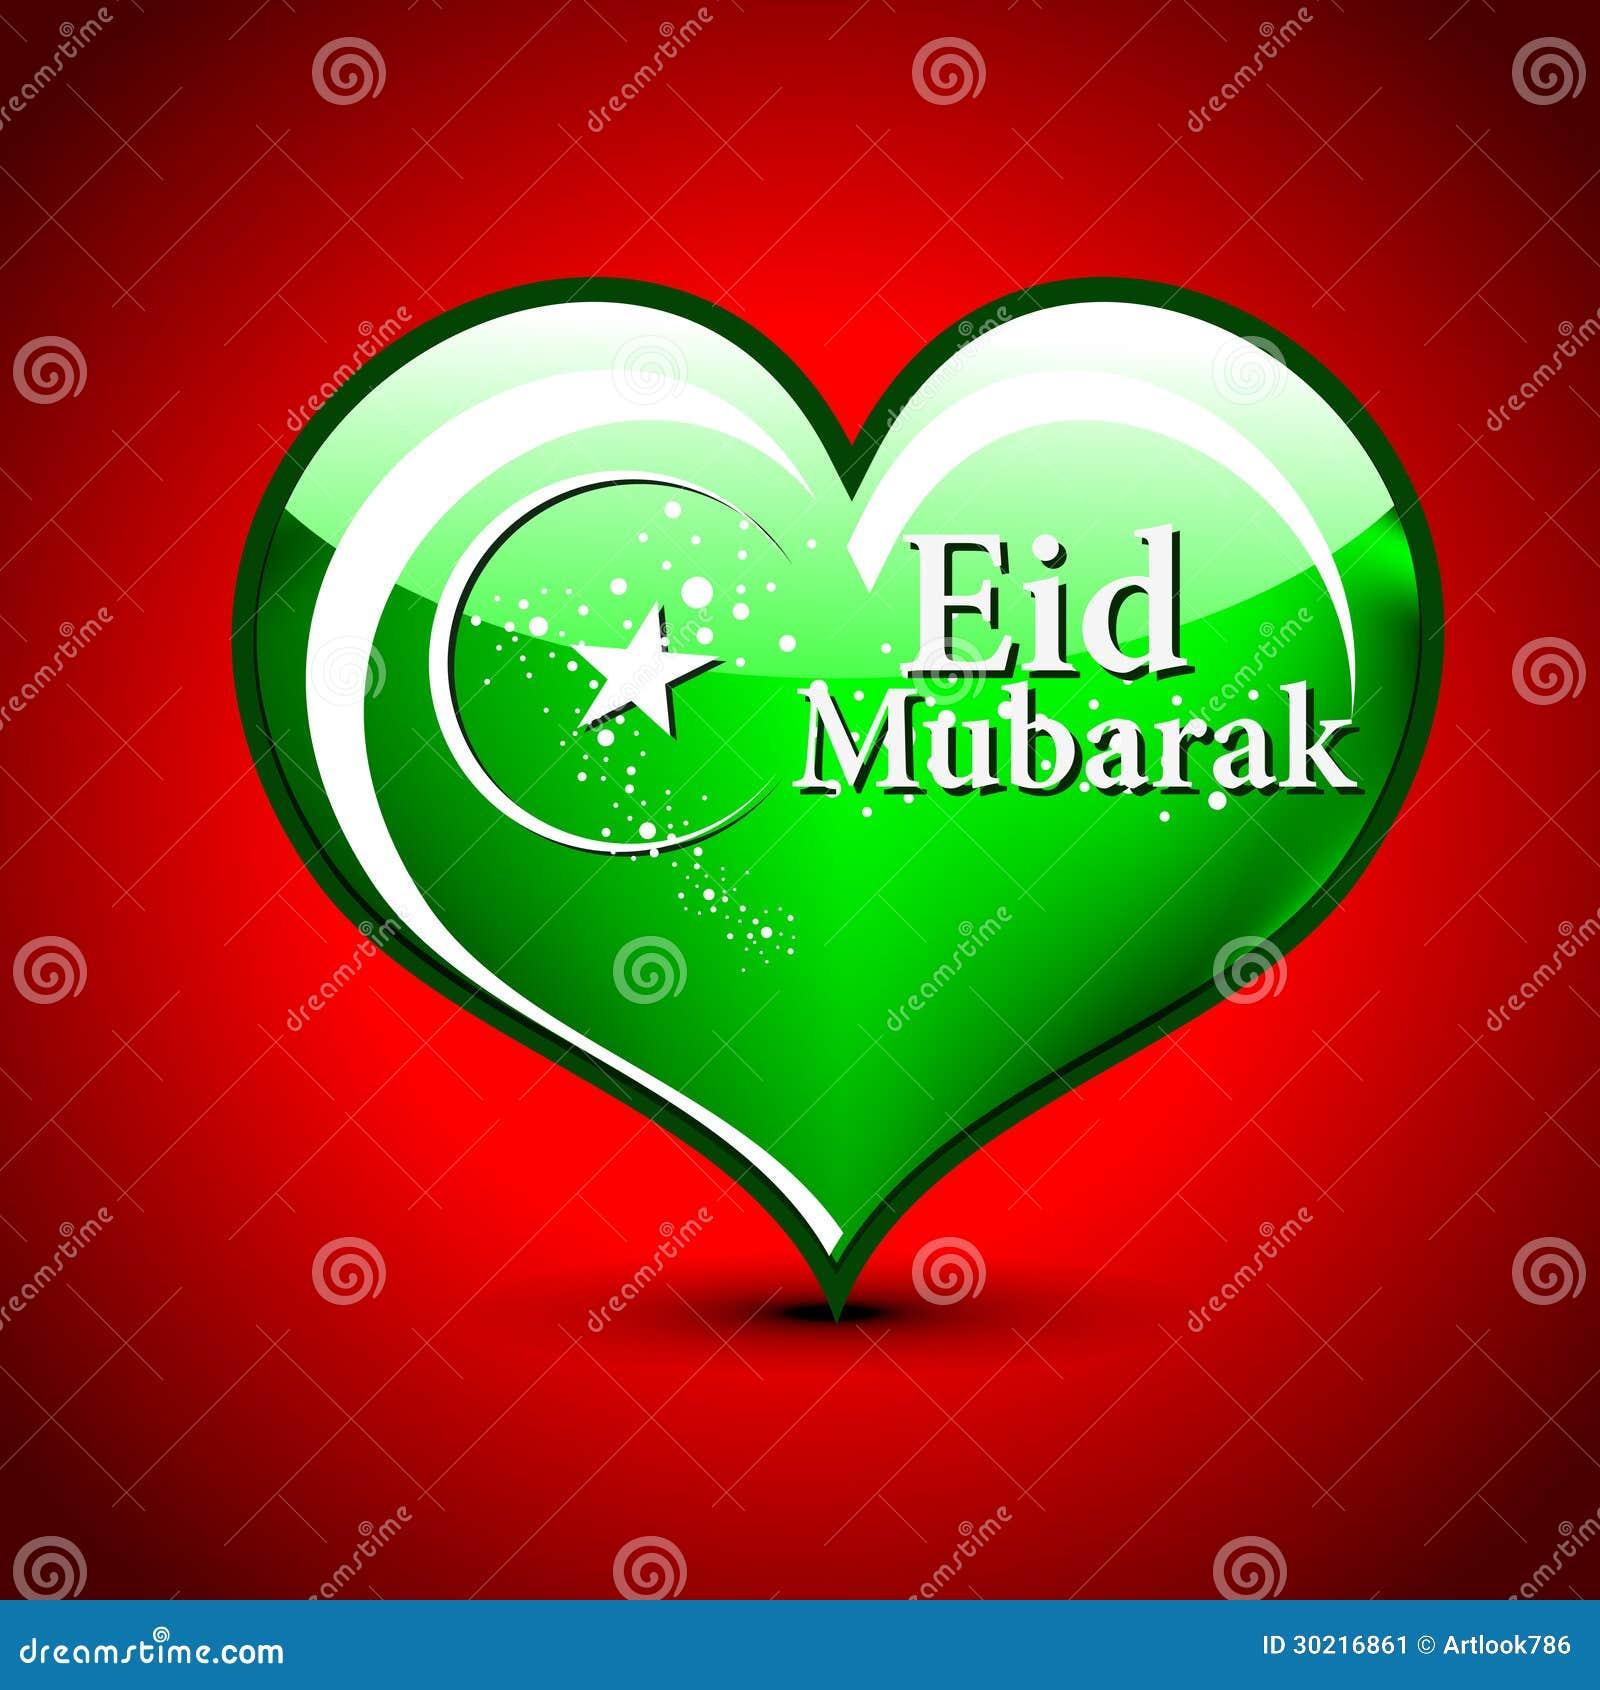 Islamic Greetings Card For Eid Mubarak Stock Image Image